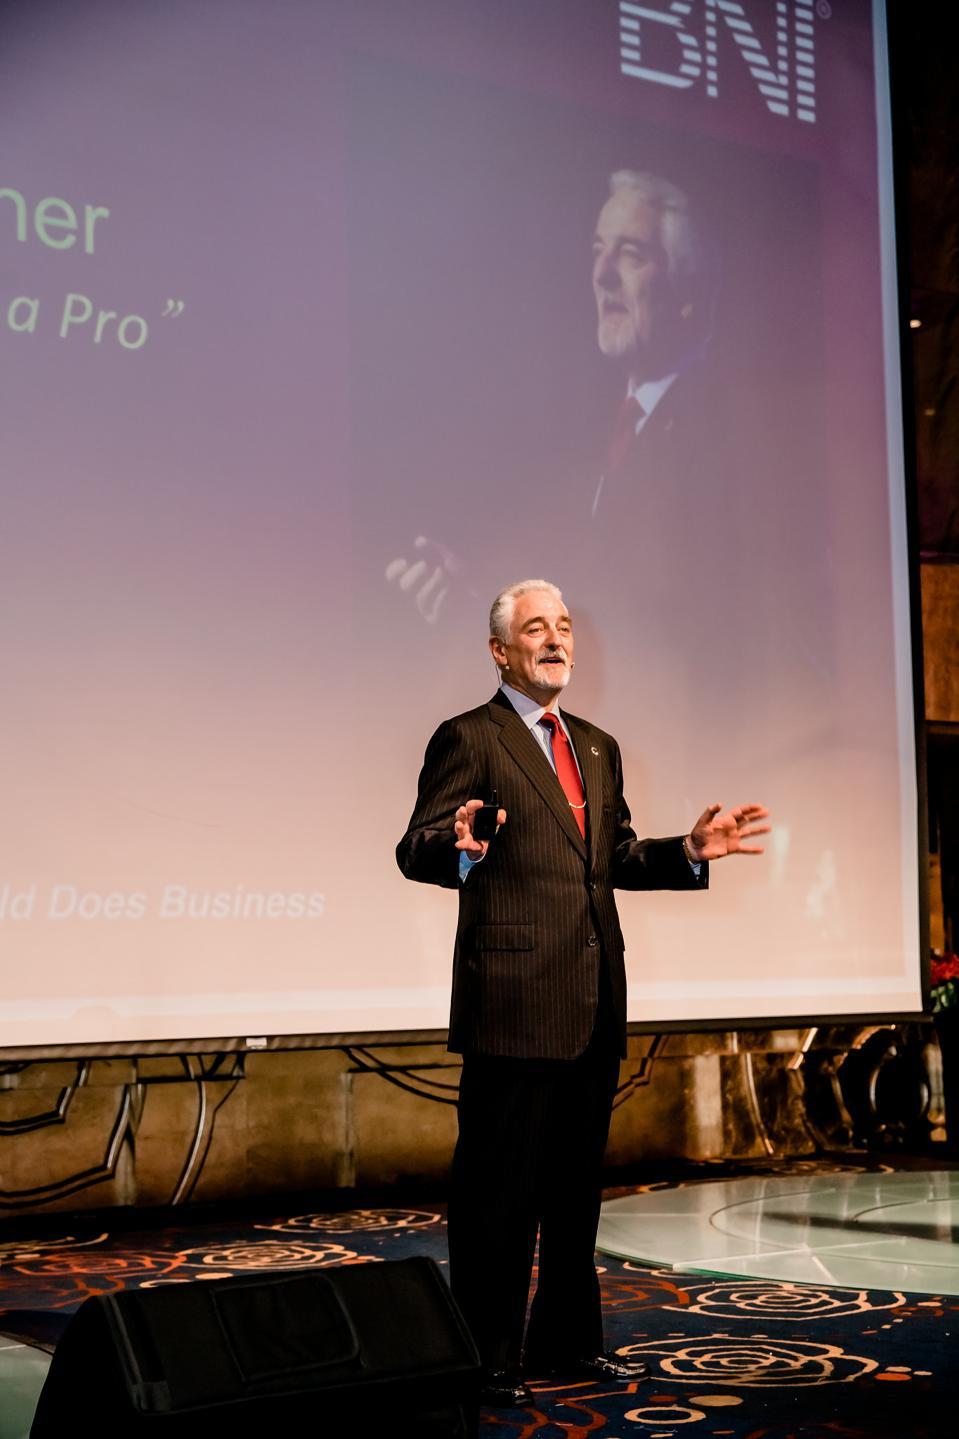 Dr. Ivan Misner, Founder & Chief Visionary Officer of BNI